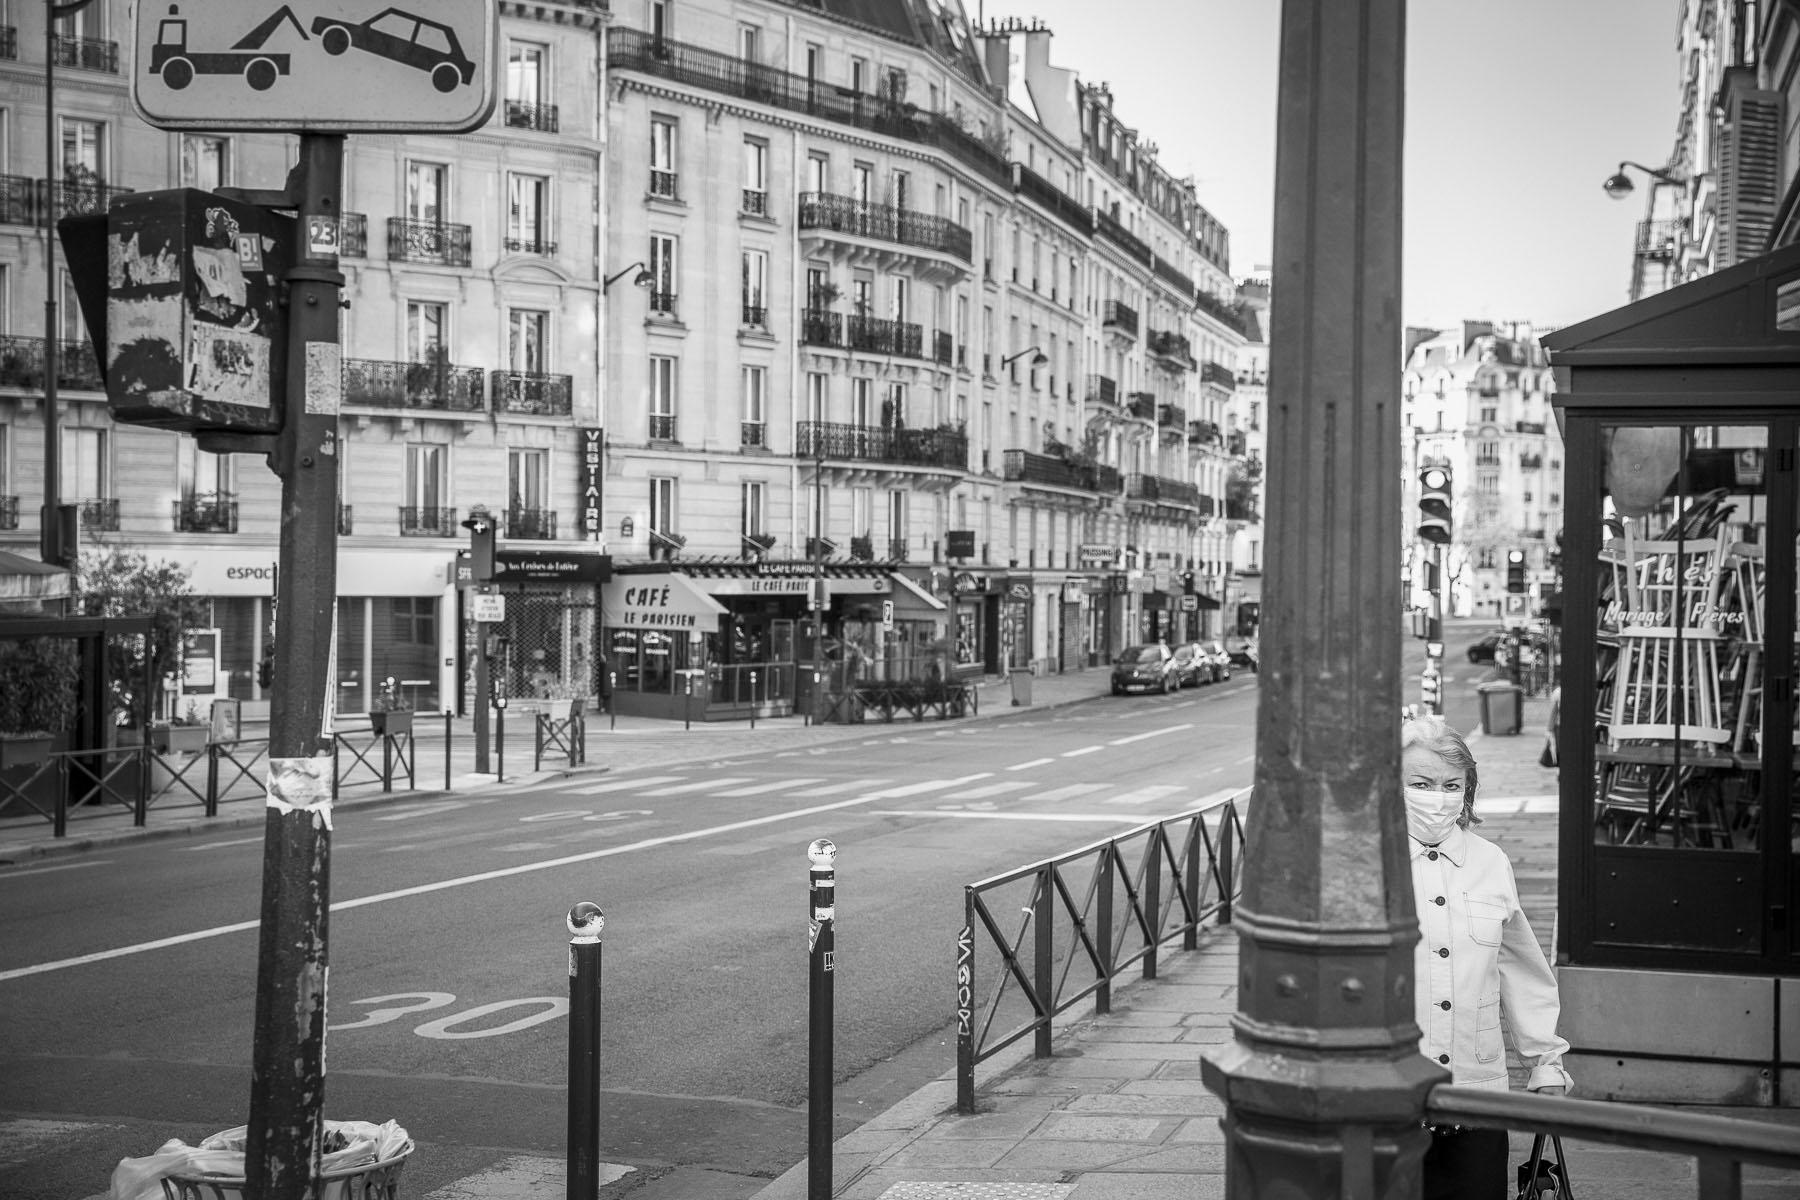 Rue Monge. April 24 2020